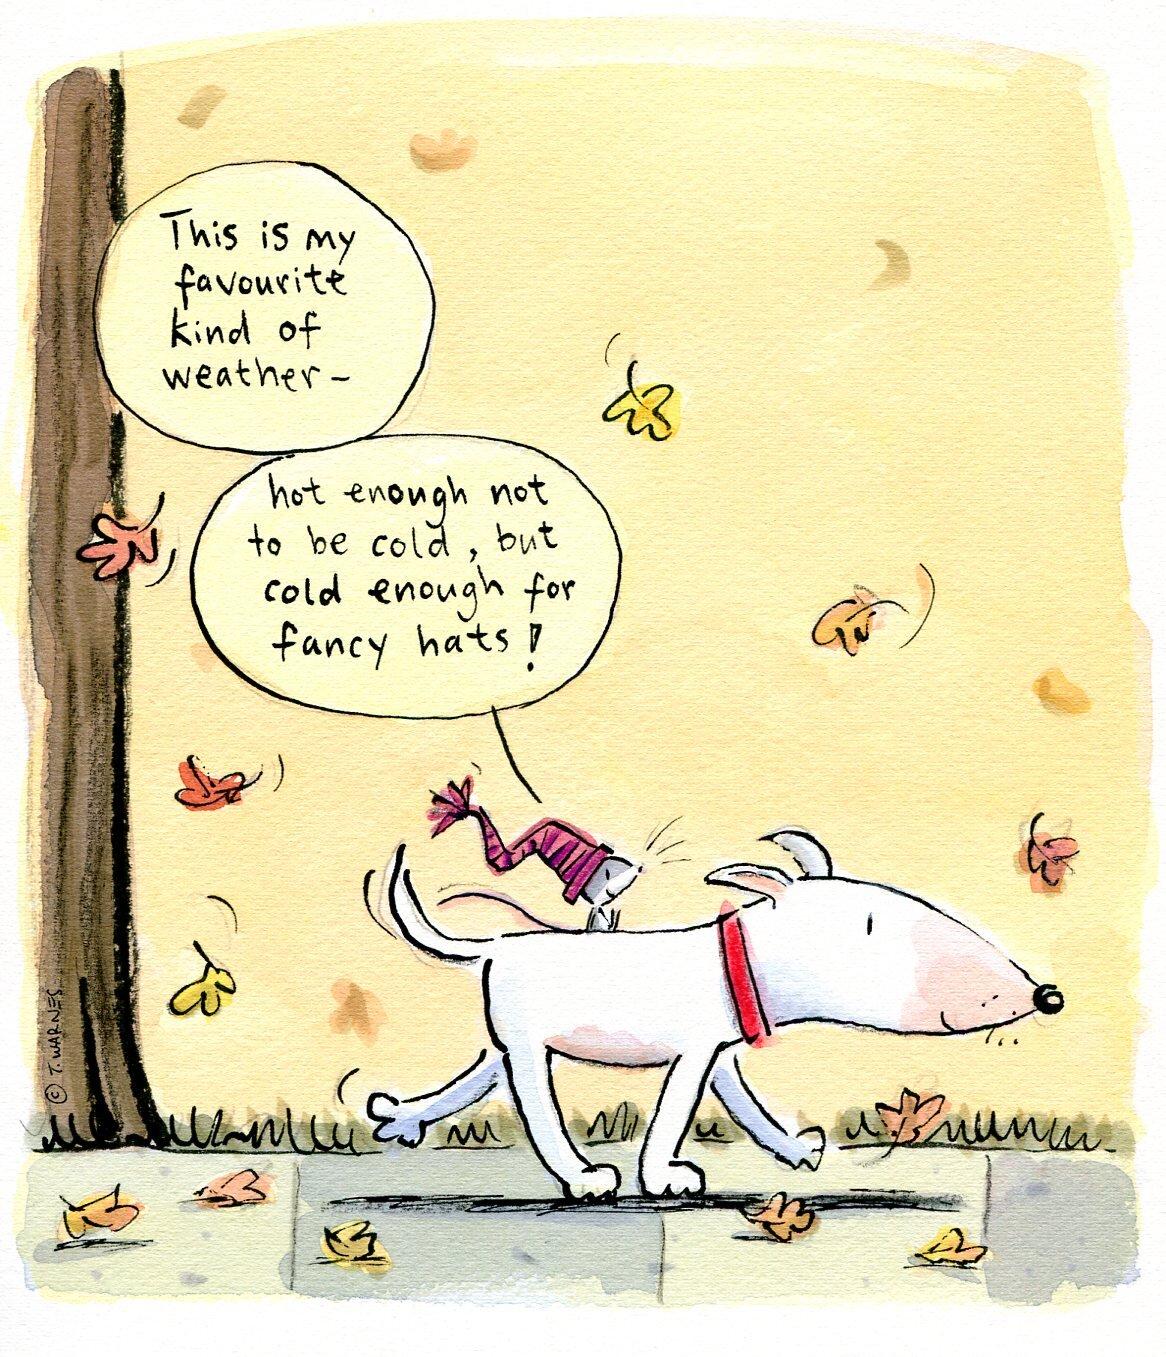 Chalk & Cheese Comics © 2011 by Tim Warnes